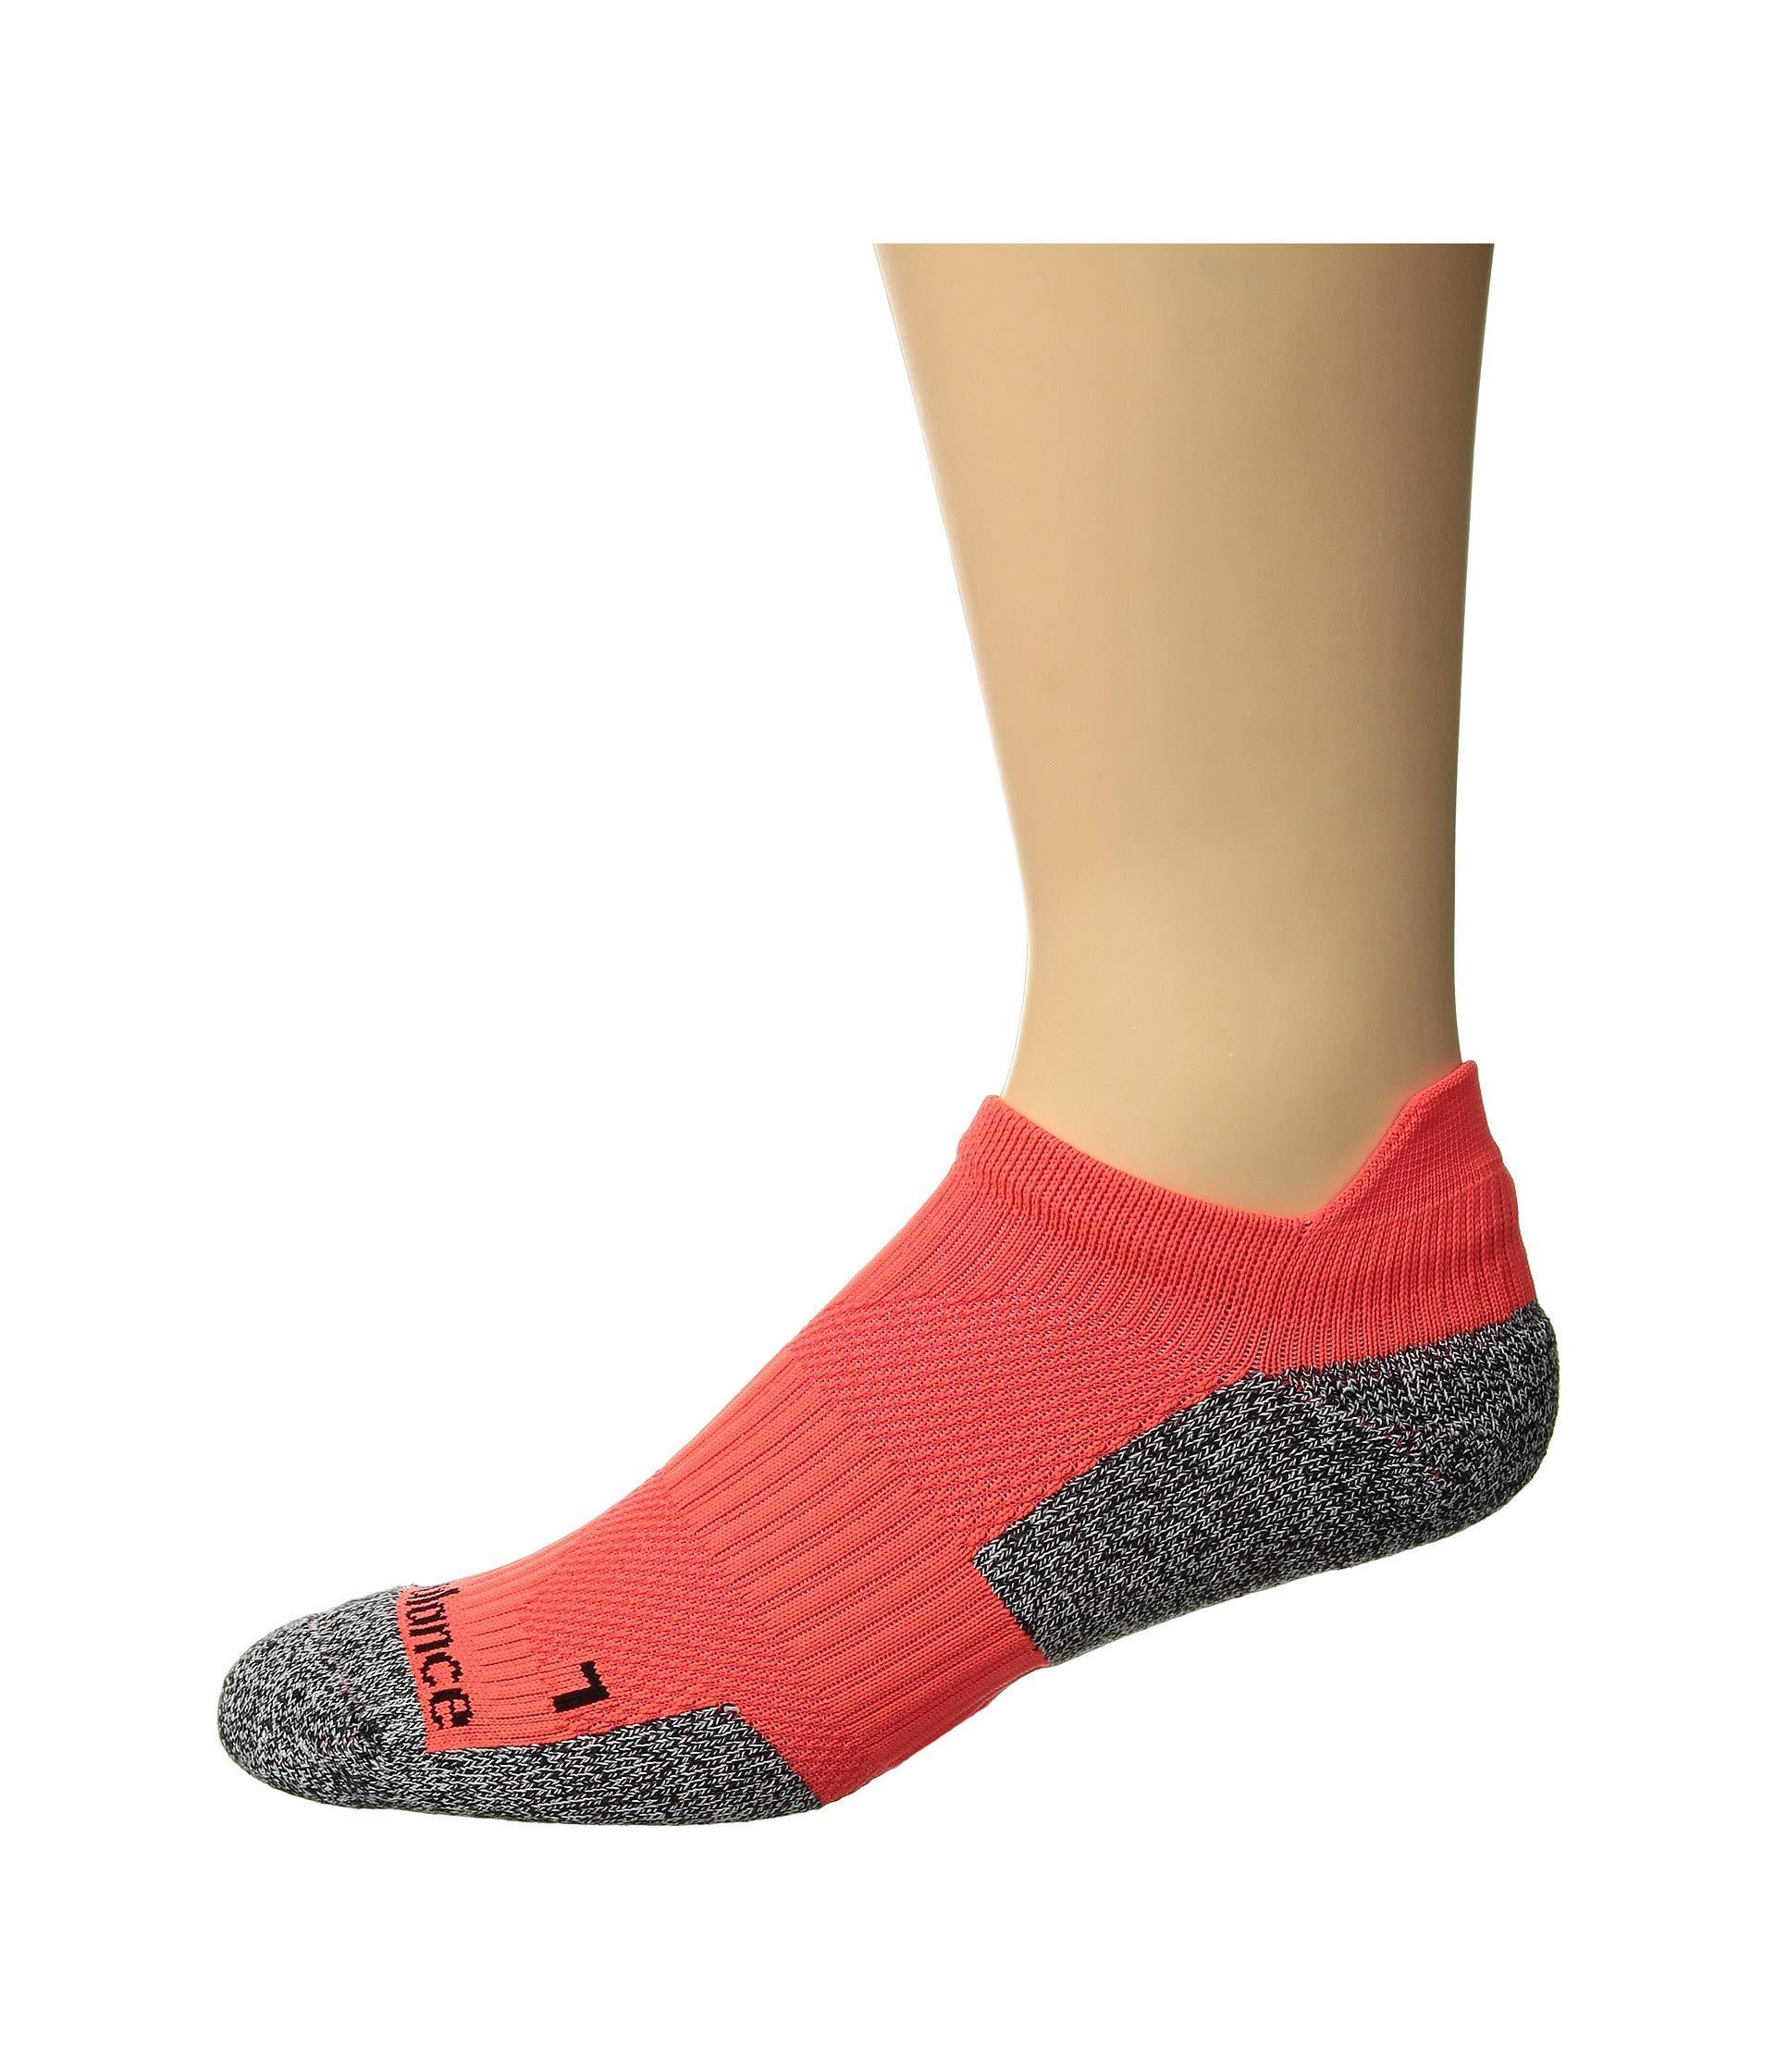 fba904eeadffc Lyst - New Balance Run Cushioned No Show Tab 1-pair (grey) No Show ...